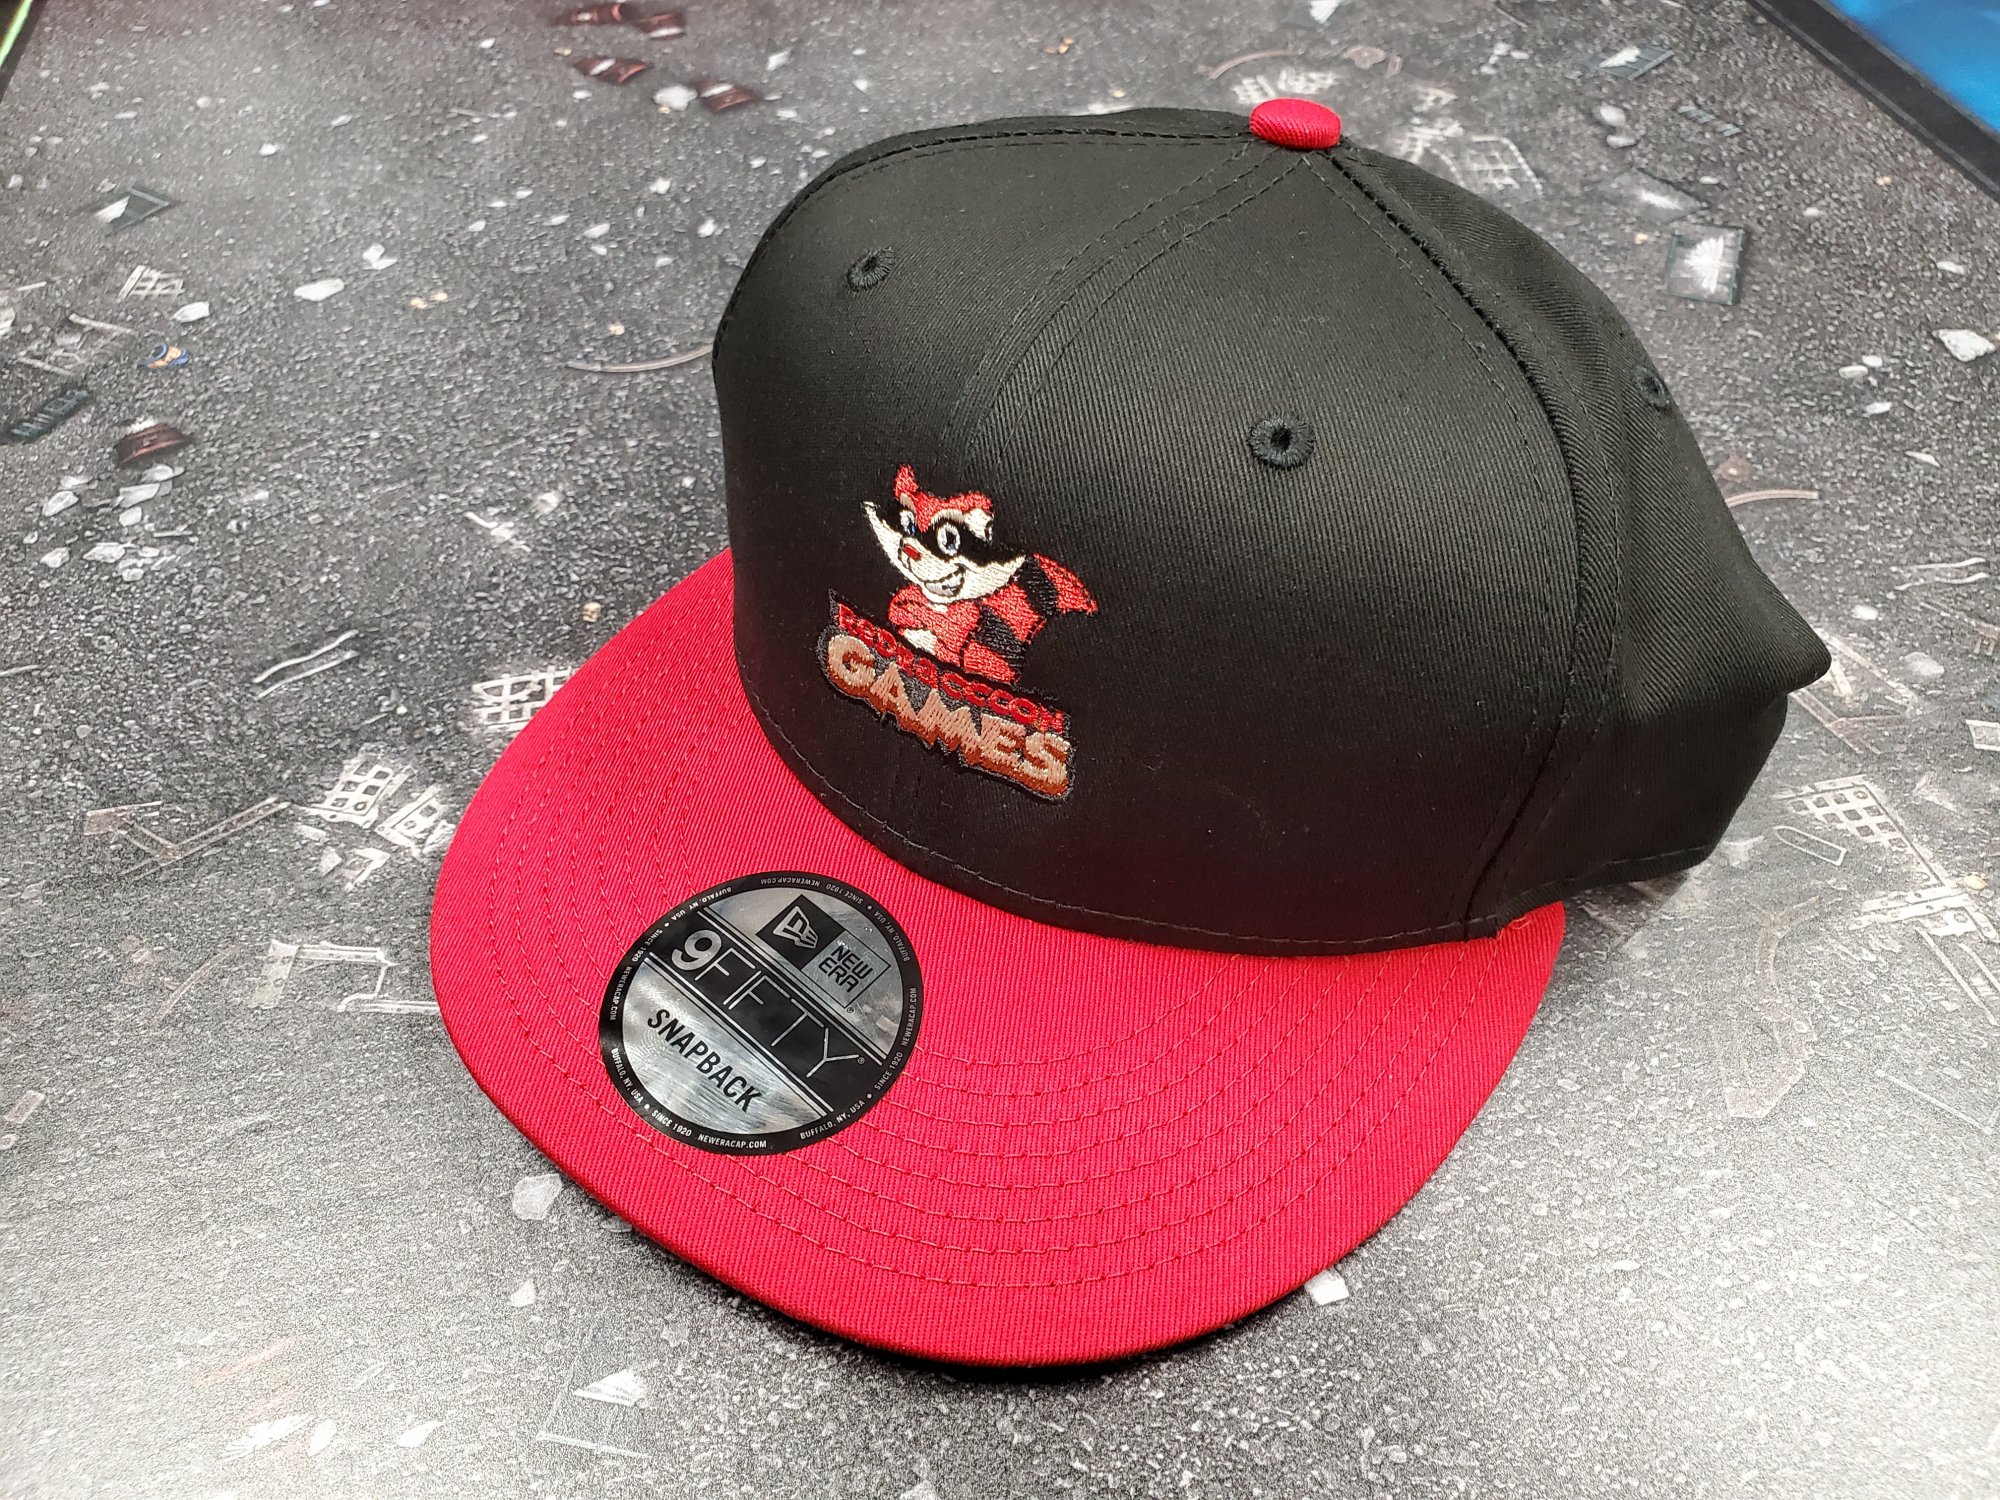 RRG Logo New Era Flat Bill Snapback Hat - Black  & Scarlet